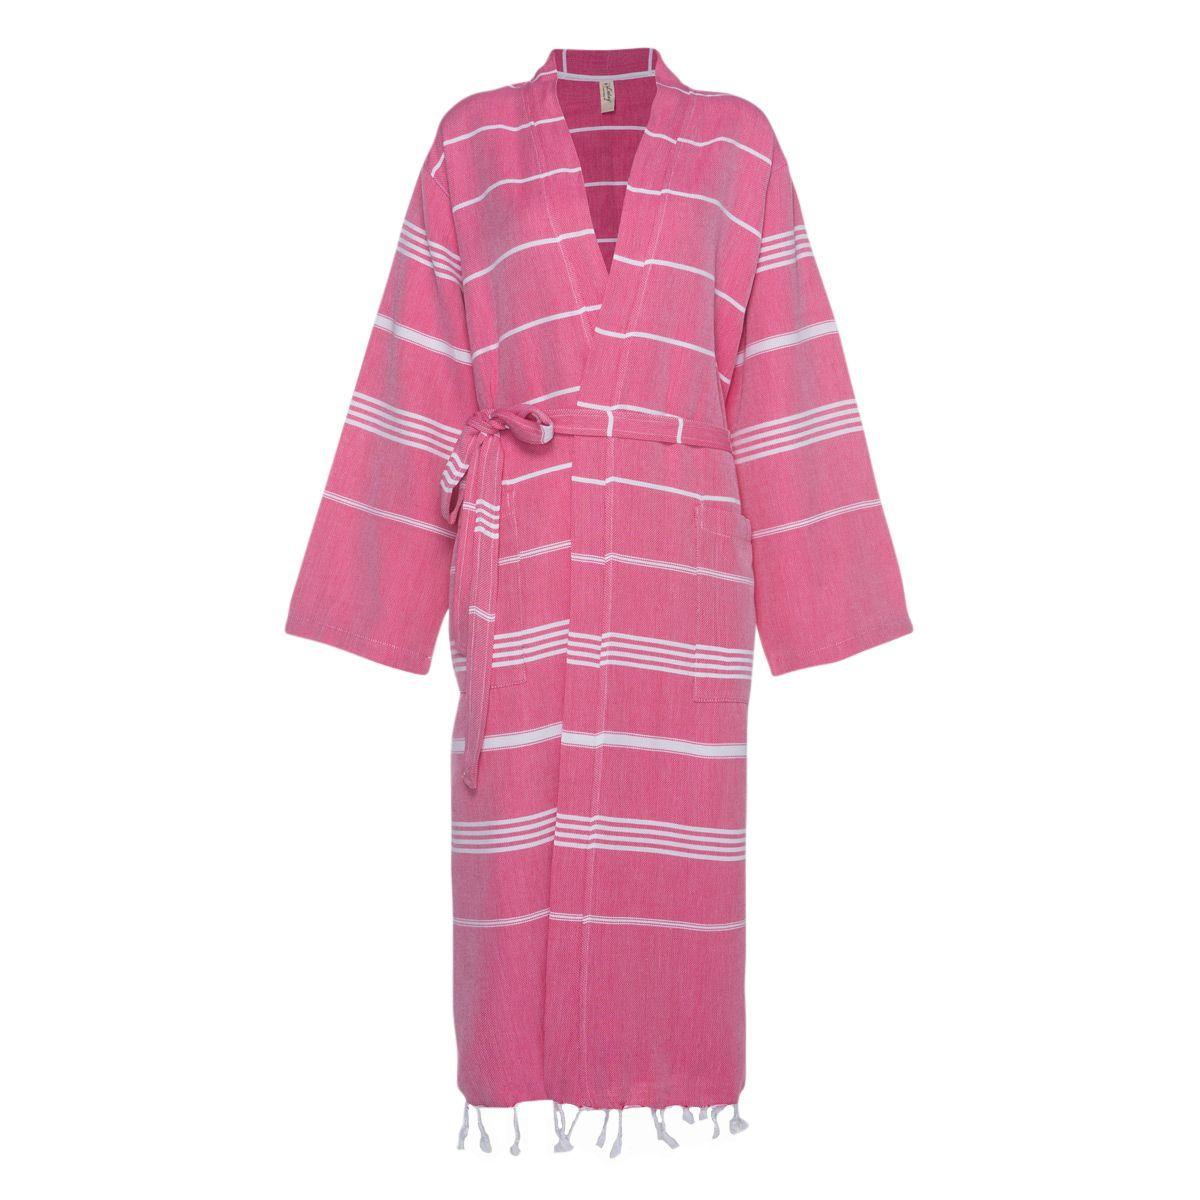 Bornoz Leyla / Kimono Yaka - Fuşya